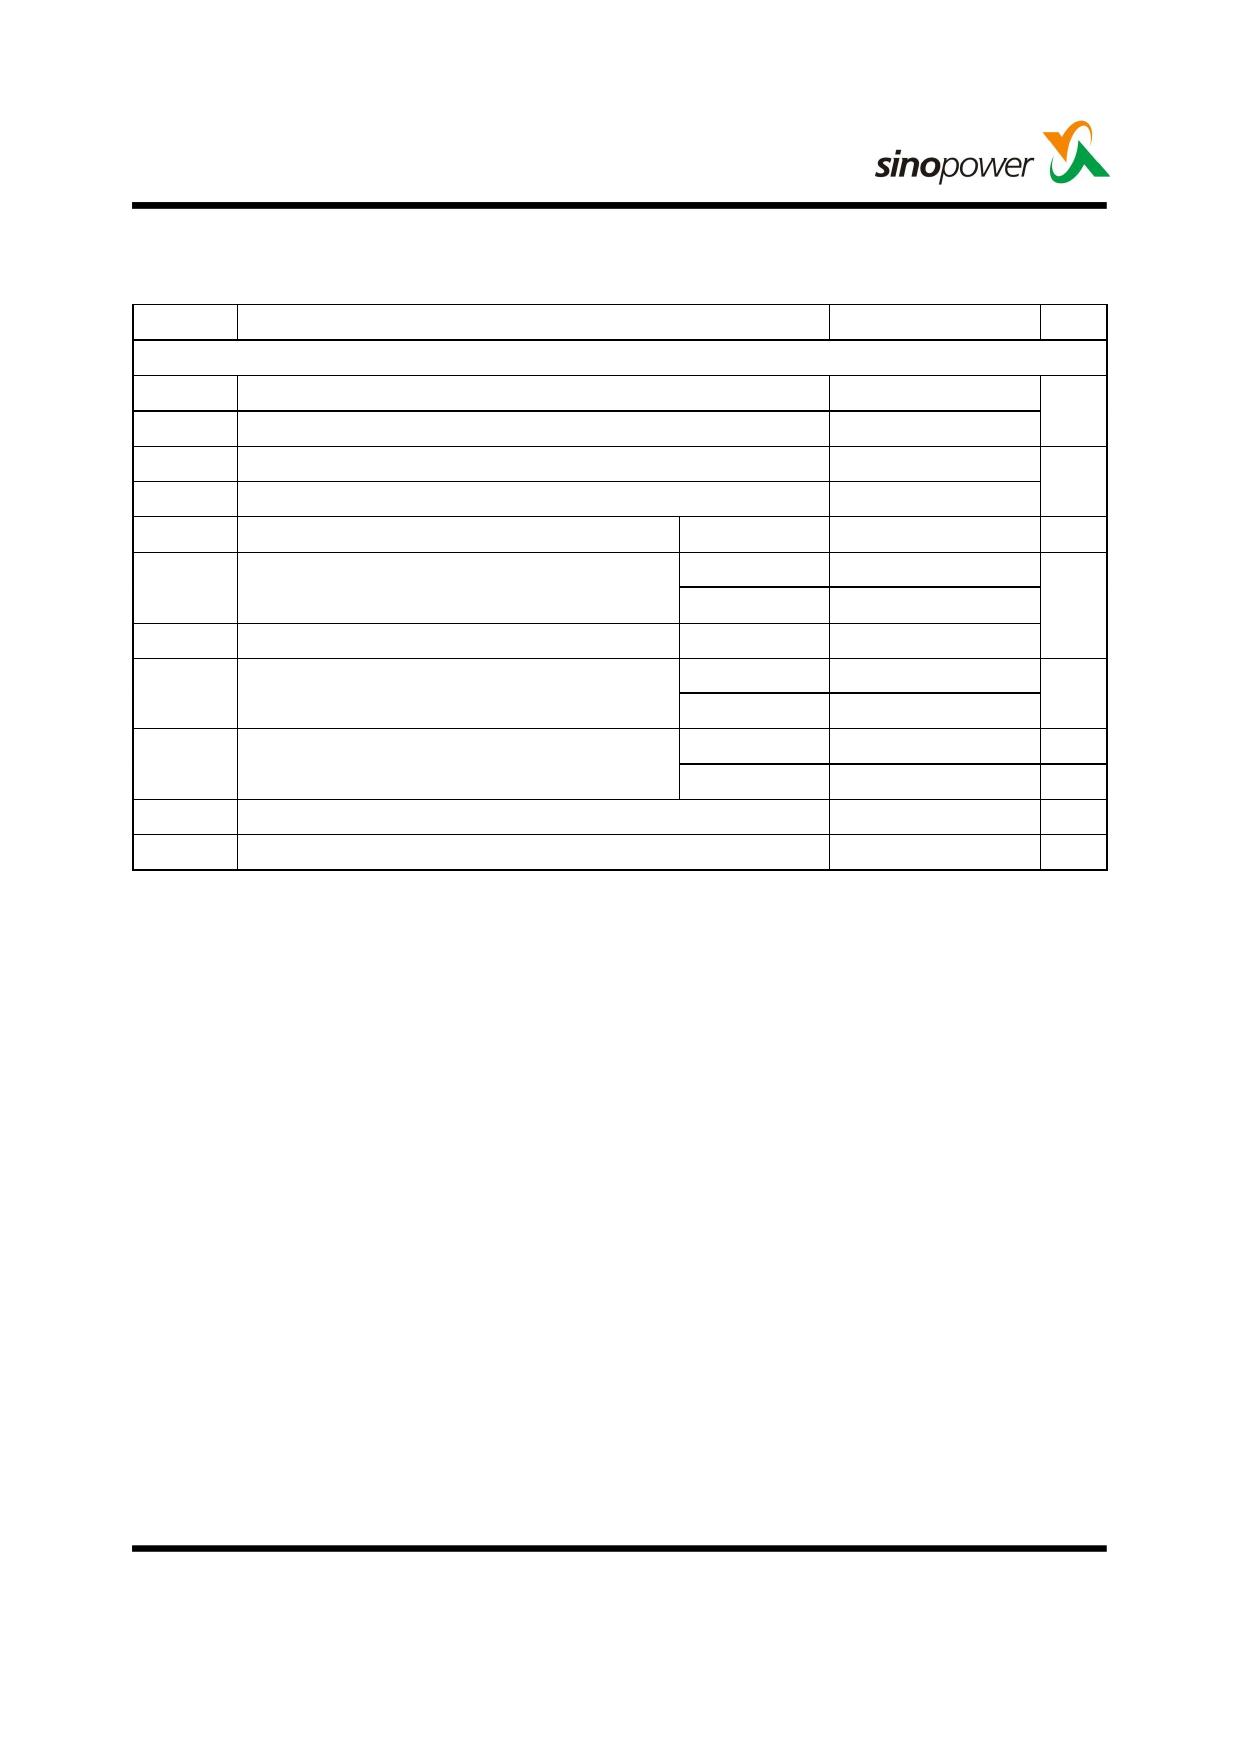 SM8008NSK pdf, equivalent, schematic